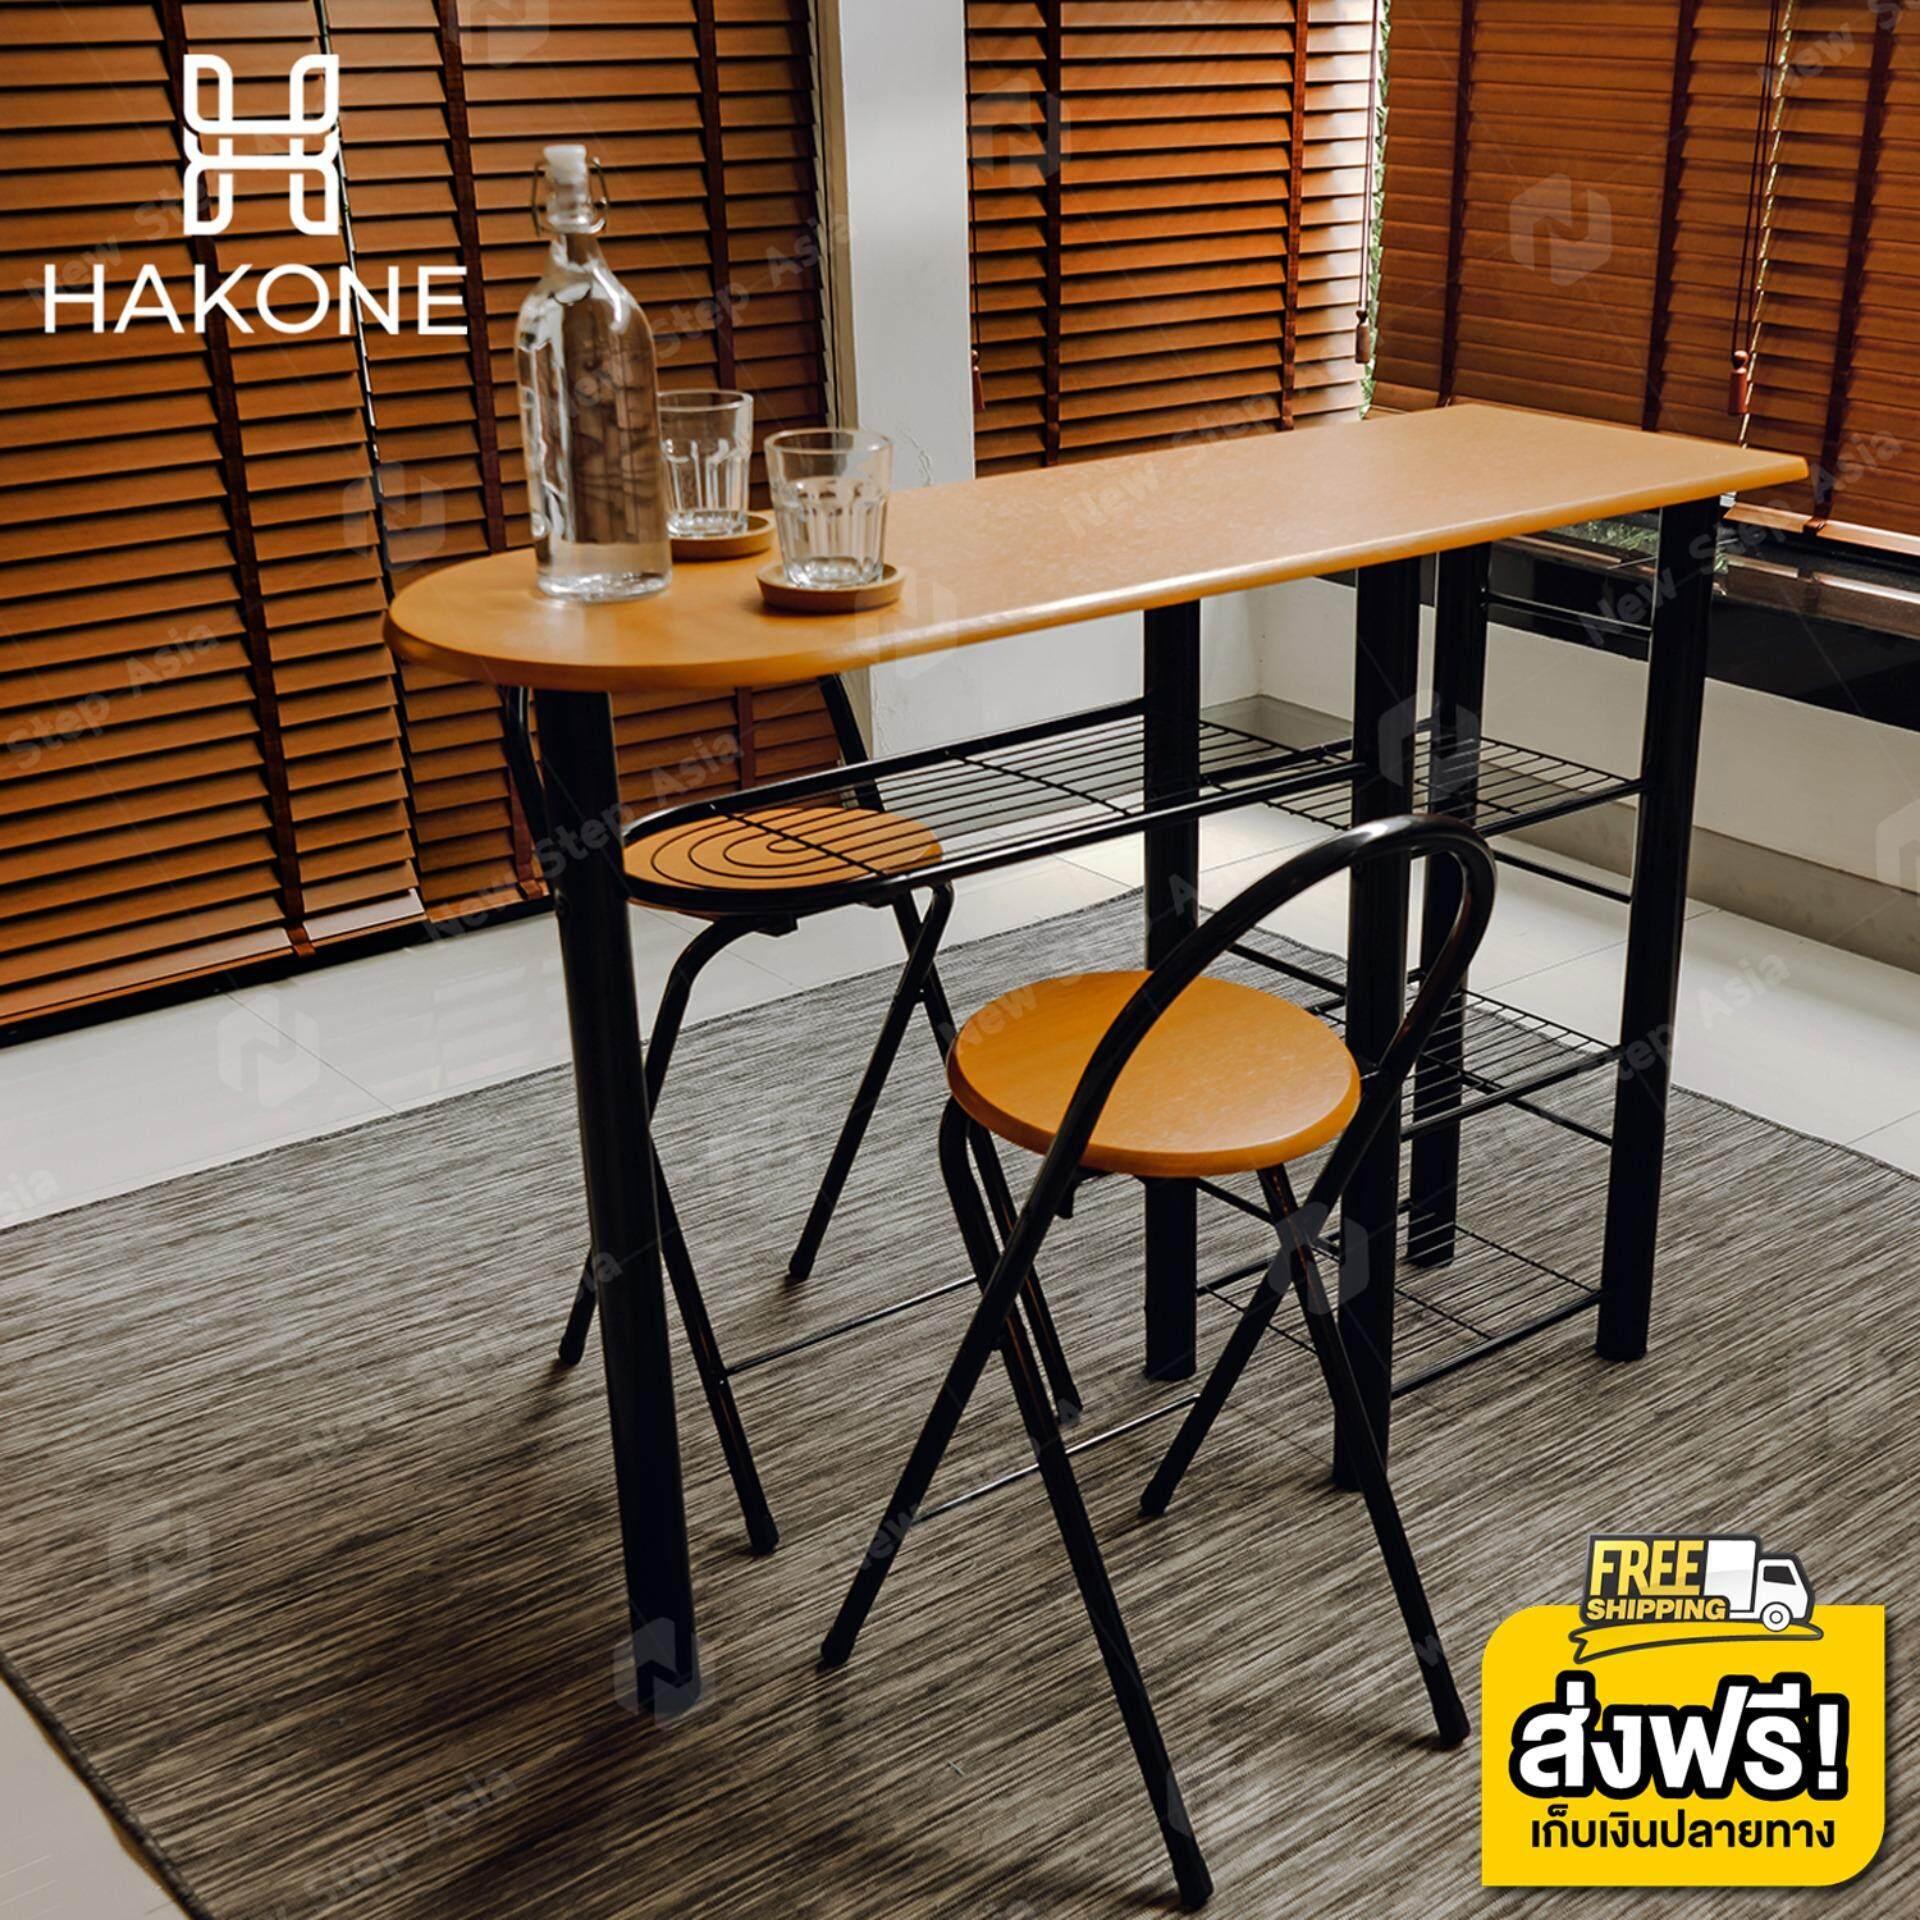 Hakone โต๊ะเคาท์เตอร์บาร์พร้อมเก้าอี้ 2 ที่นั่ง ชุดโต๊ะพร้อมเก้าอี้ ลายไม้ สีไม้สัก สูง 88 Cm โต๊ะ โต๊ะกินข้าว โต๊ะกลาง ชุดโต๊ะกินข้าว โต๊ะกินข้าว โต๊ะอาหาร Dining Table New Step Asia By Homehuk - New Step Asia.